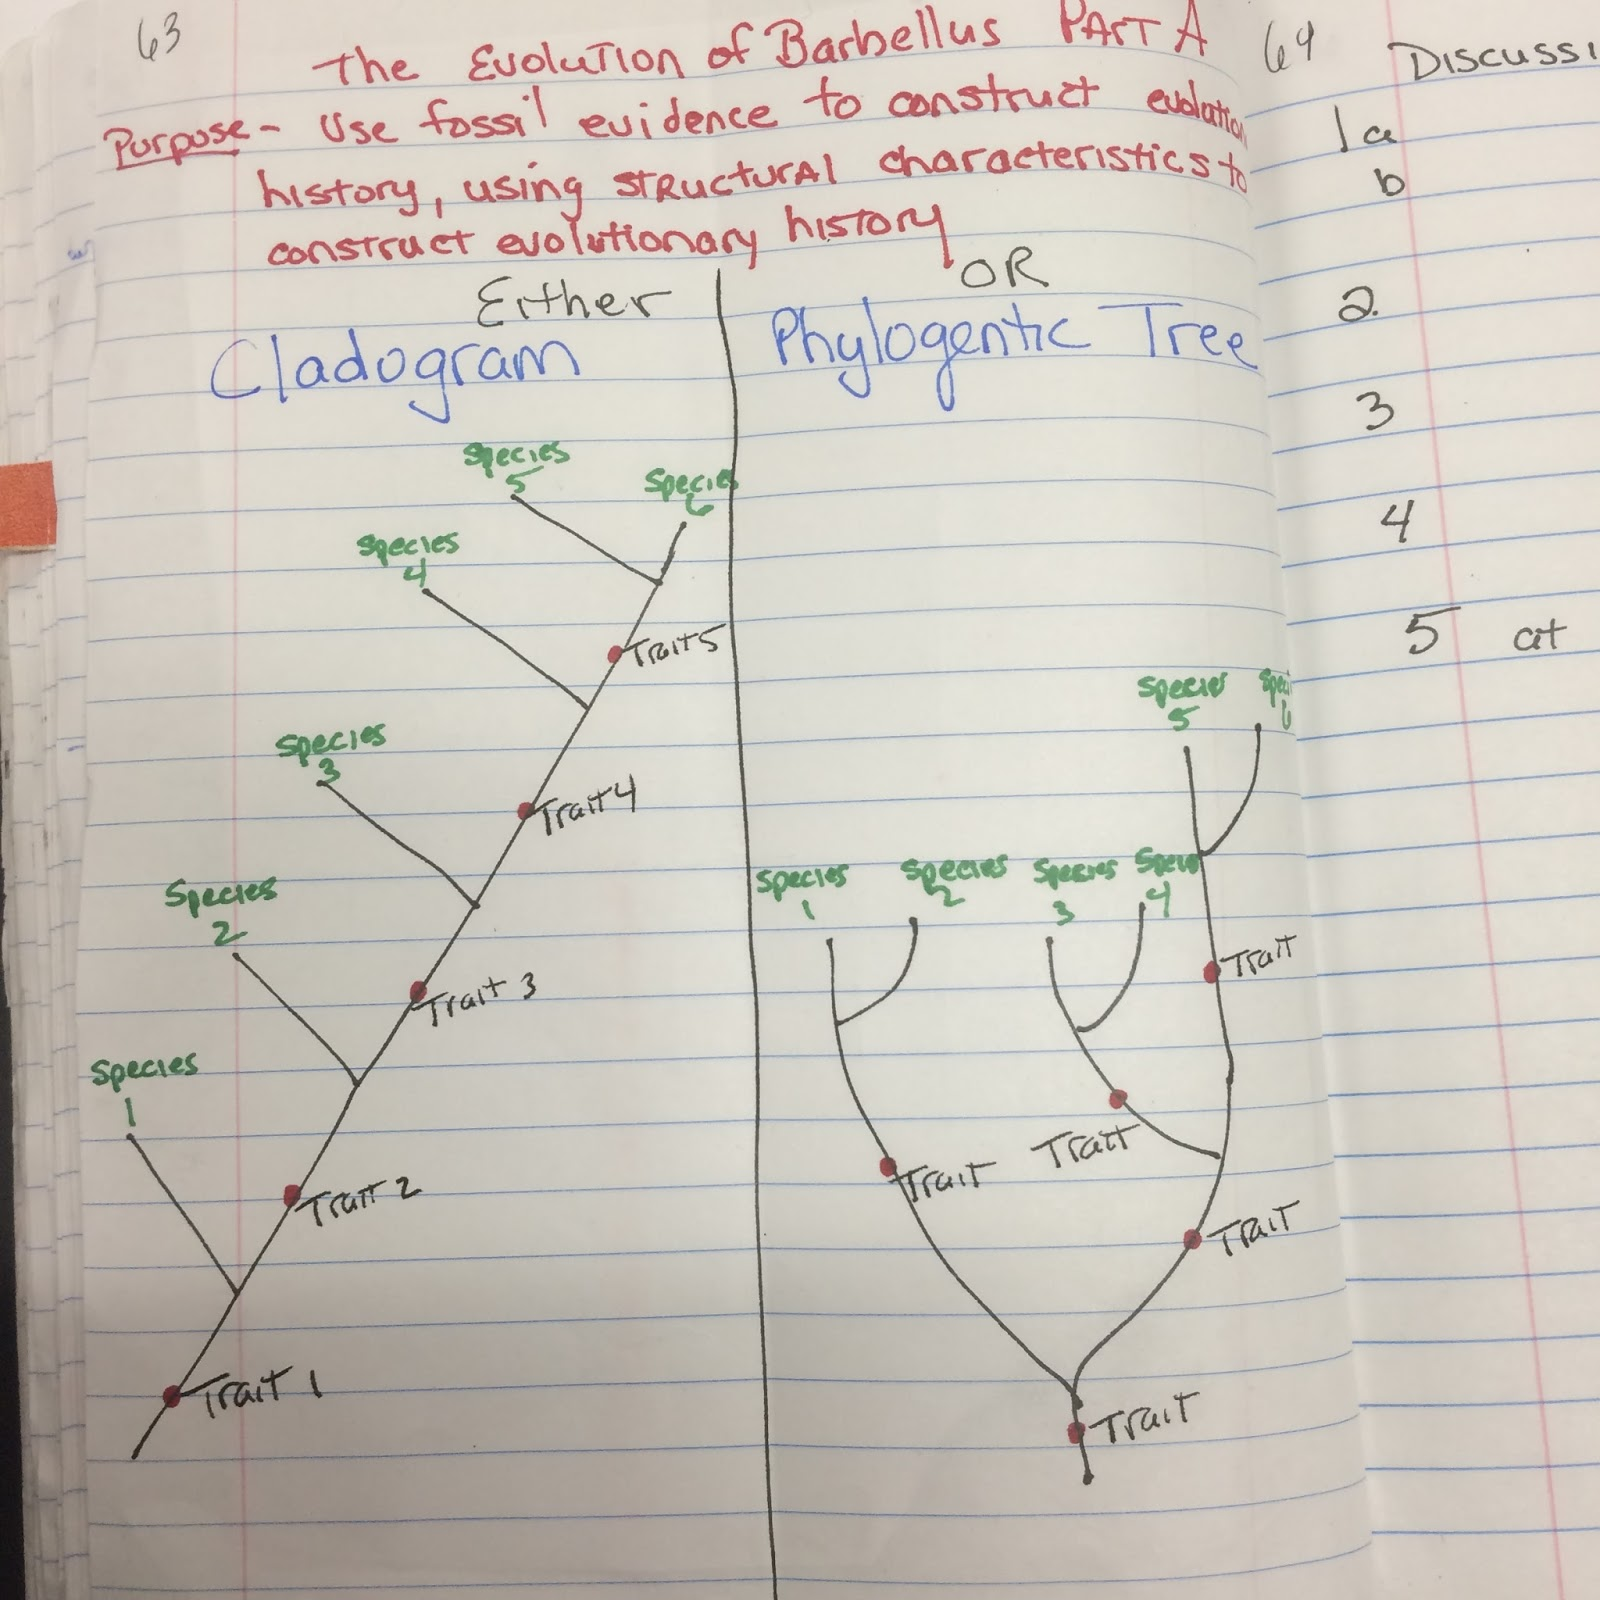 Mrs. Greeley Howard's Biology Class: January 2016